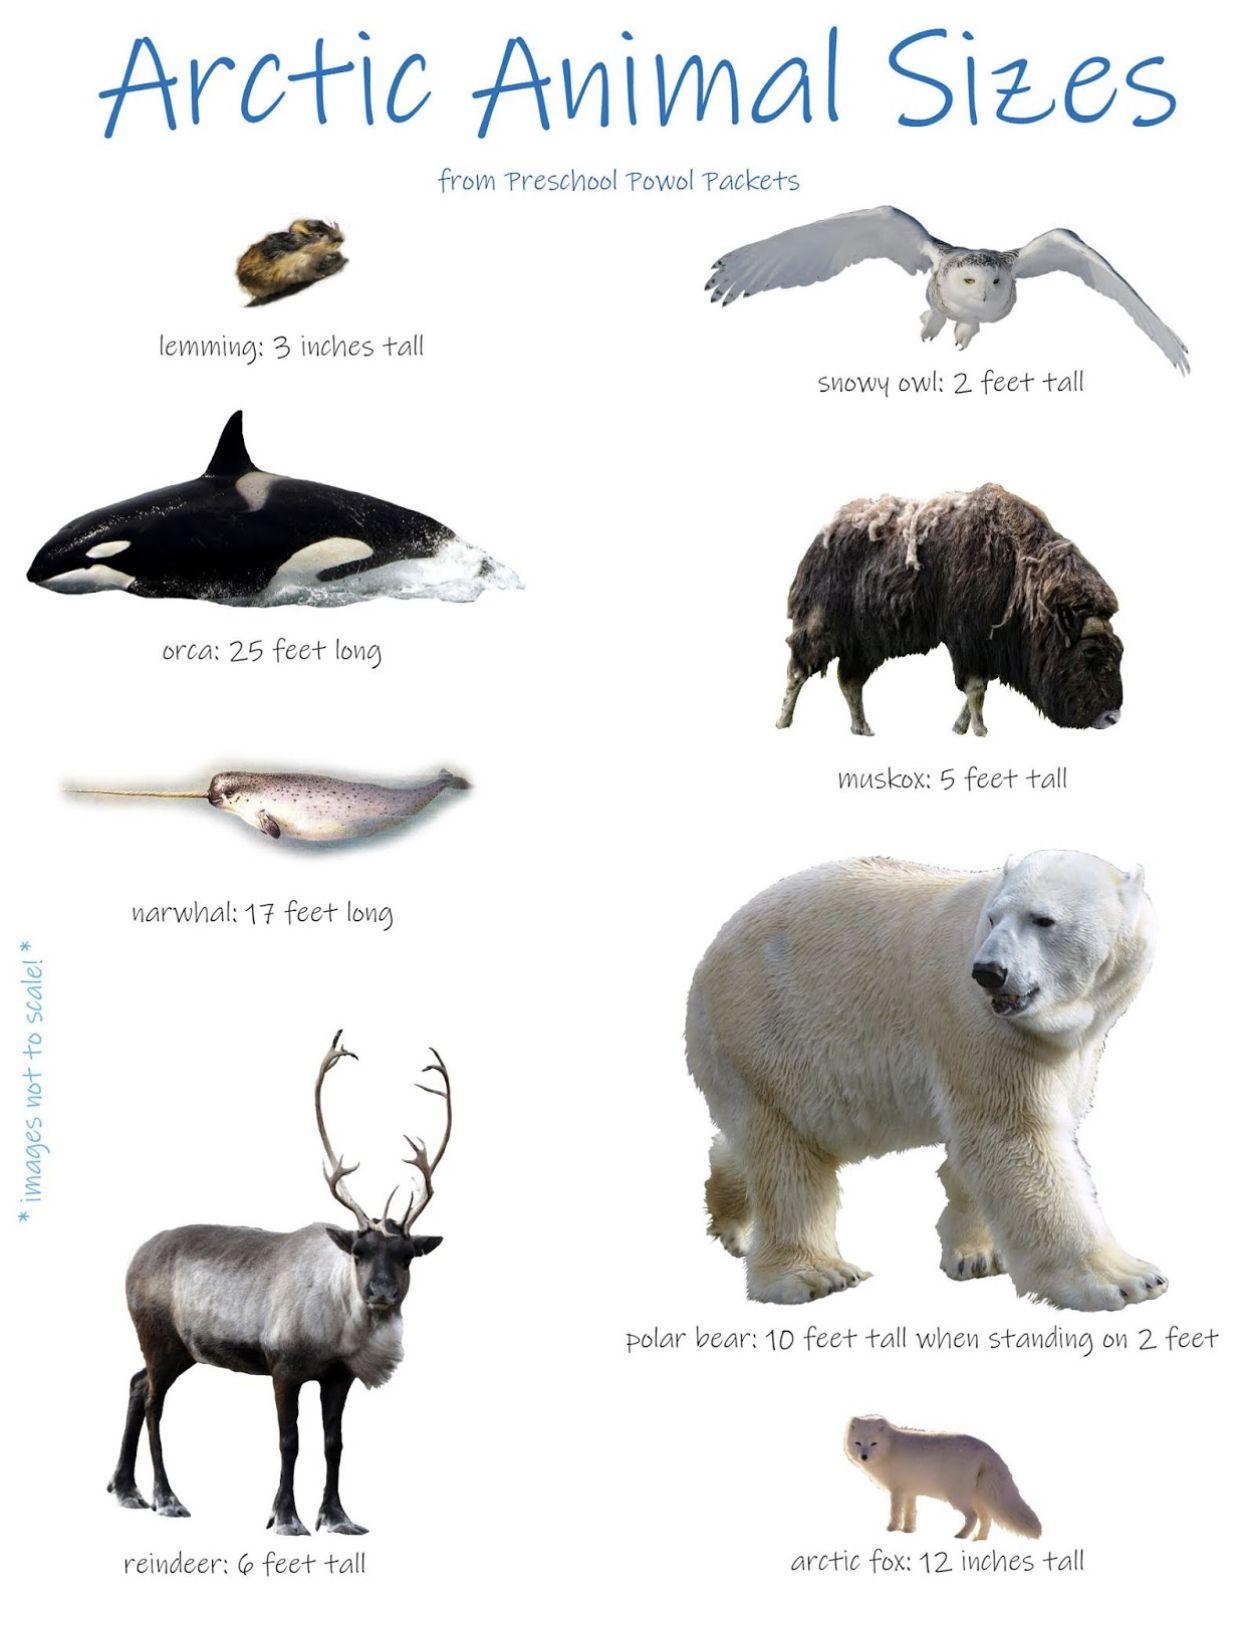 Pin By Michi On Winter Arctic Animals Arctic Animals Preschool Polar Animals [ 1626 x 1242 Pixel ]